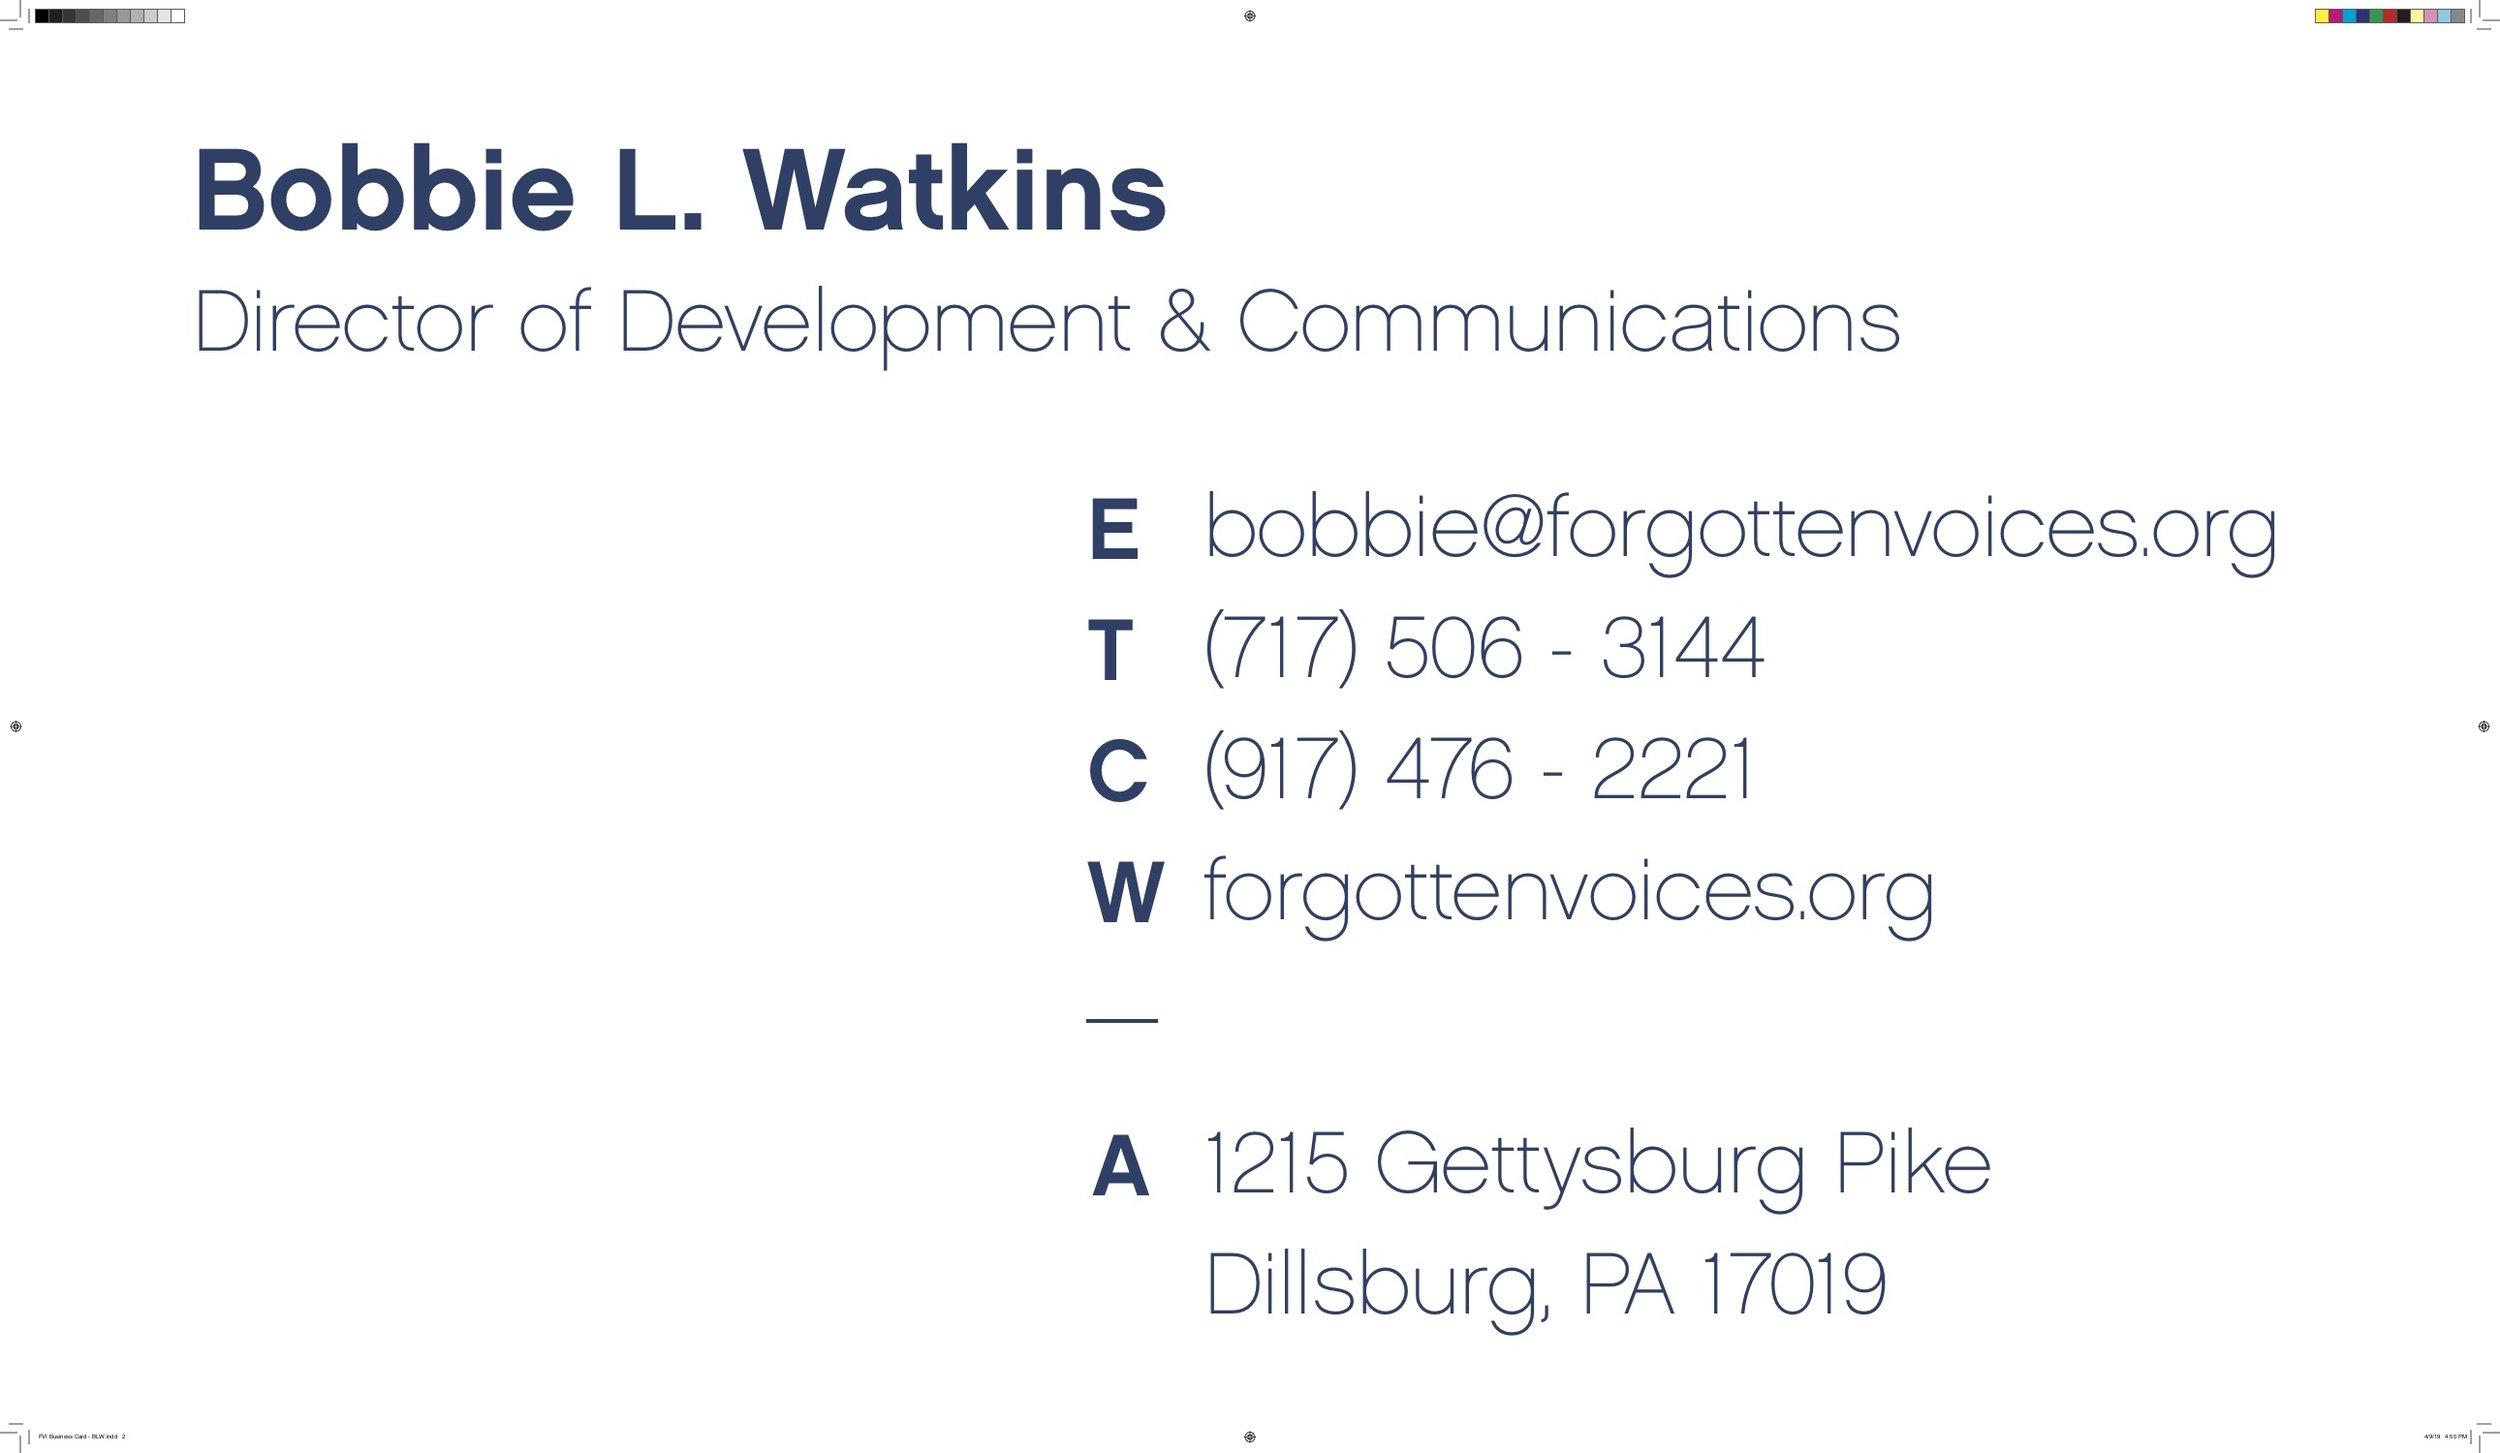 FVI Business Cards - BLW FINAL2.jpg